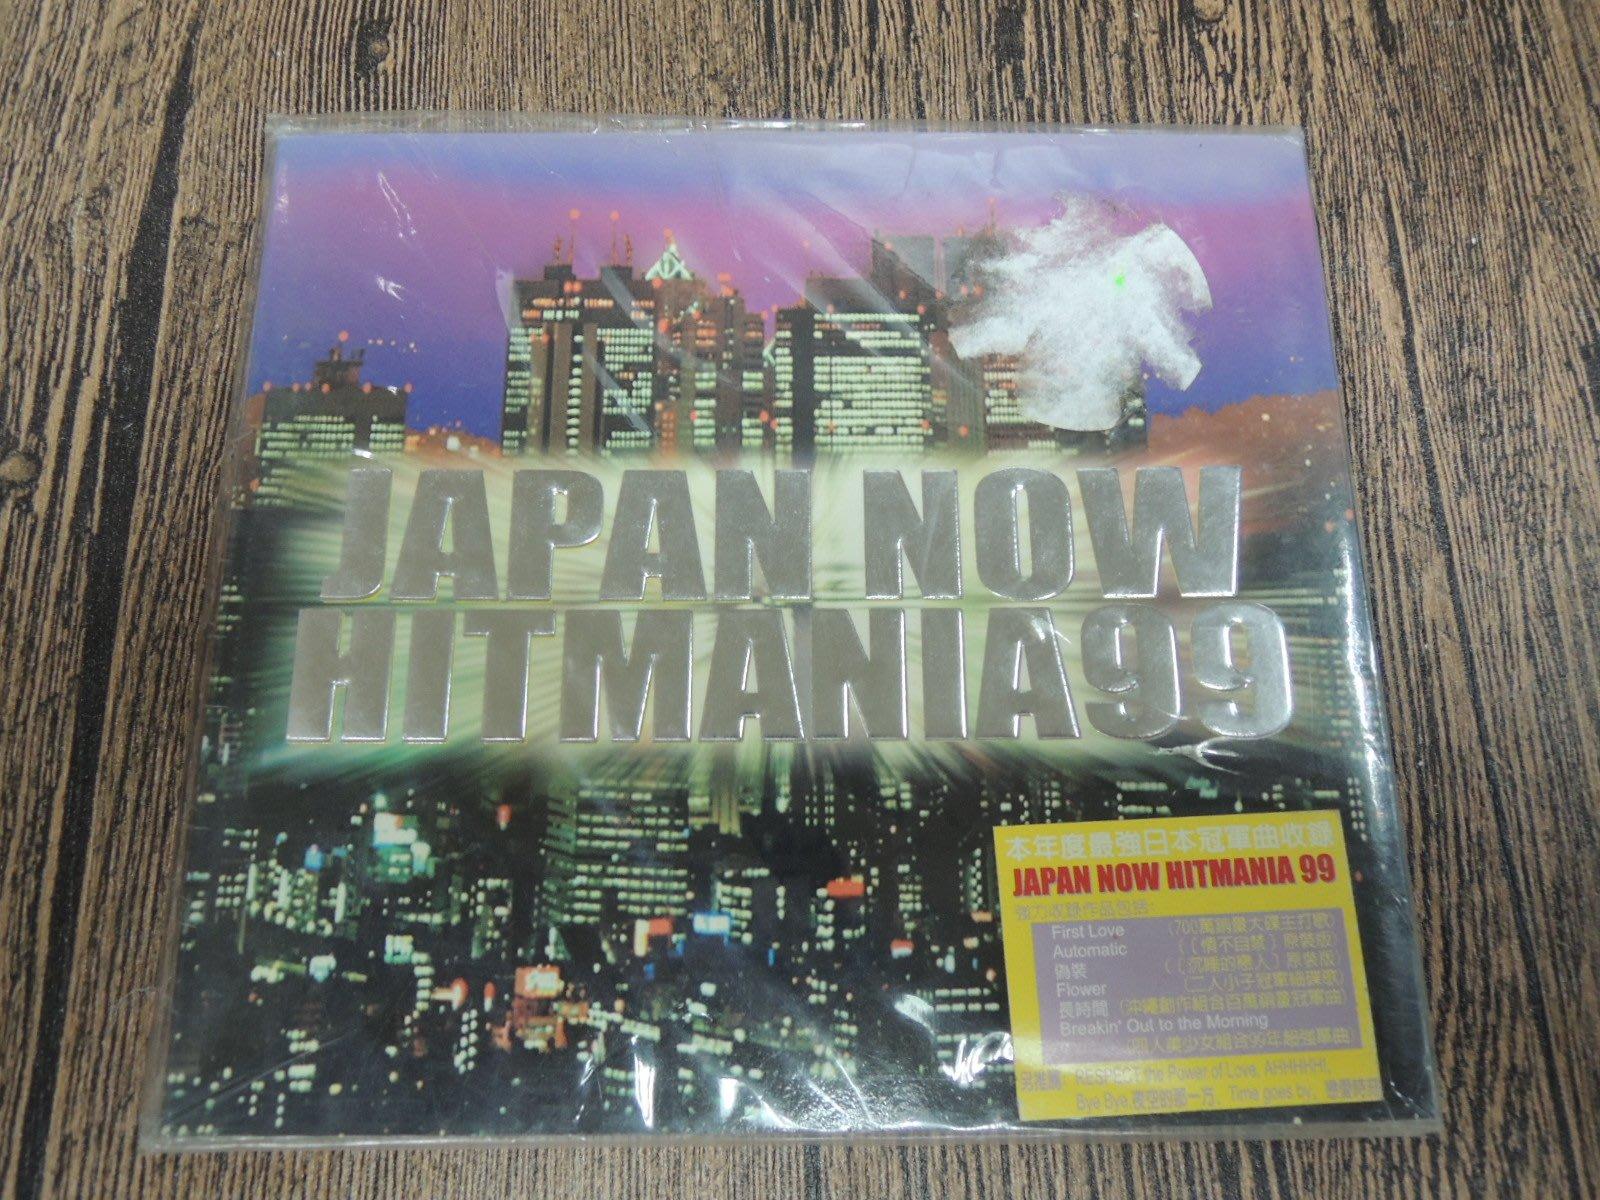 Q2002-早期CD未拆】JAPAN NOW HITMANIA 99 - 收錄宇多田、竹內瑪利亞、米希亞等